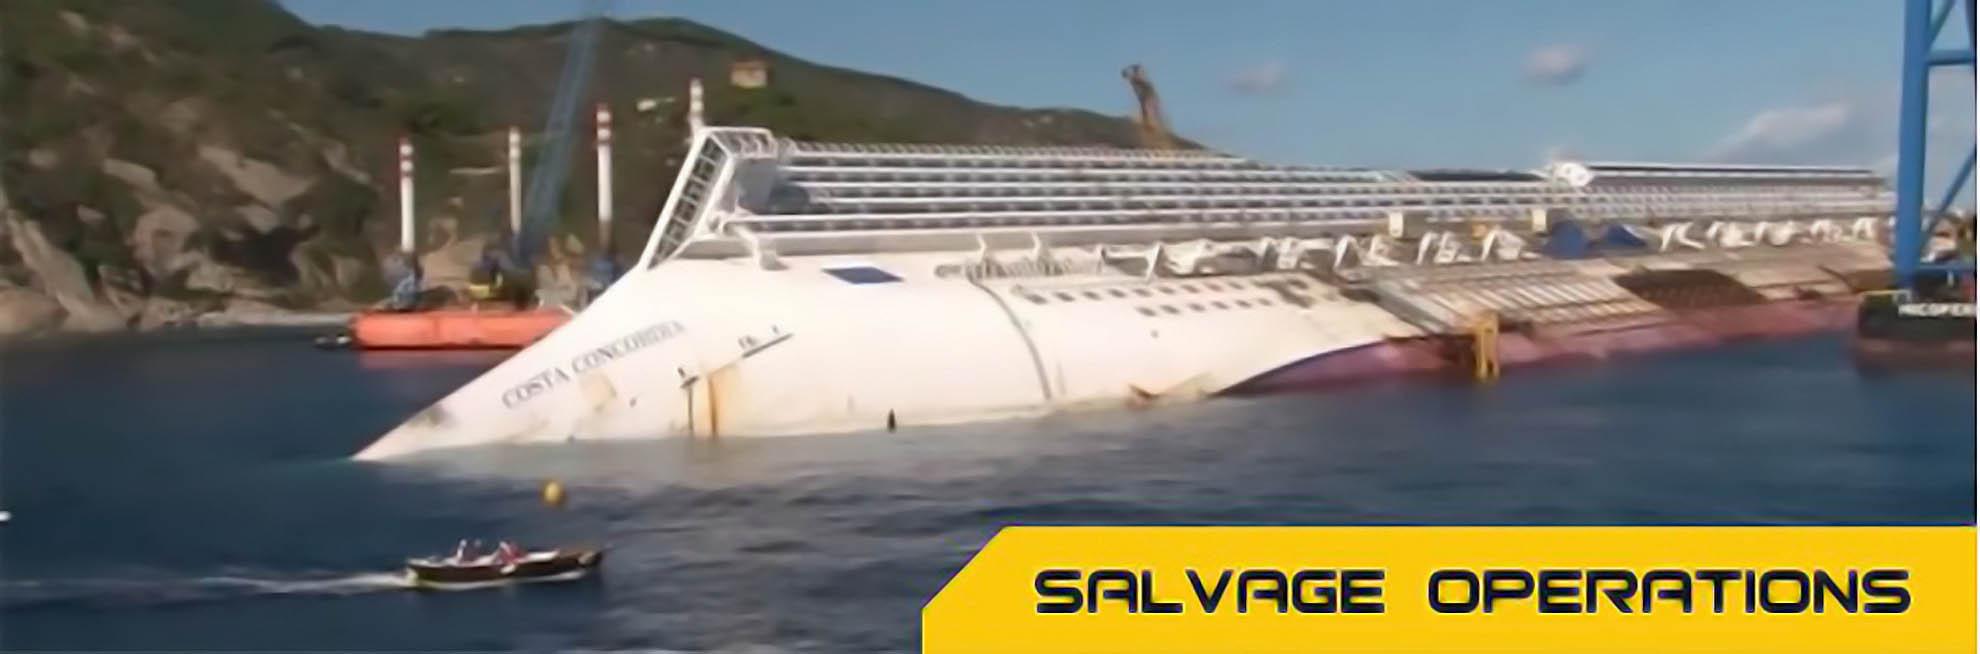 2016-sloane-marine-website-services-slider